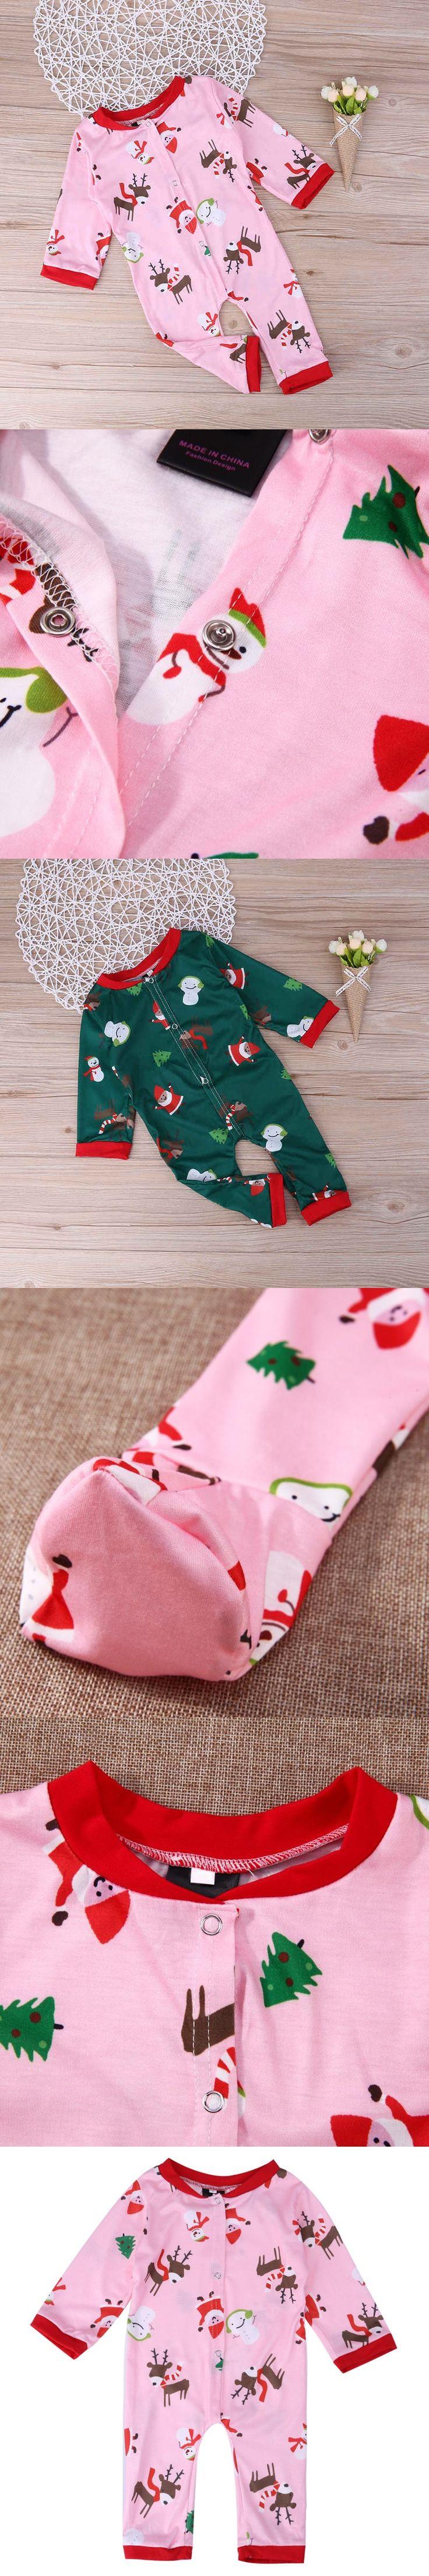 best baby winter clothes images children toys ideas. Black Bedroom Furniture Sets. Home Design Ideas